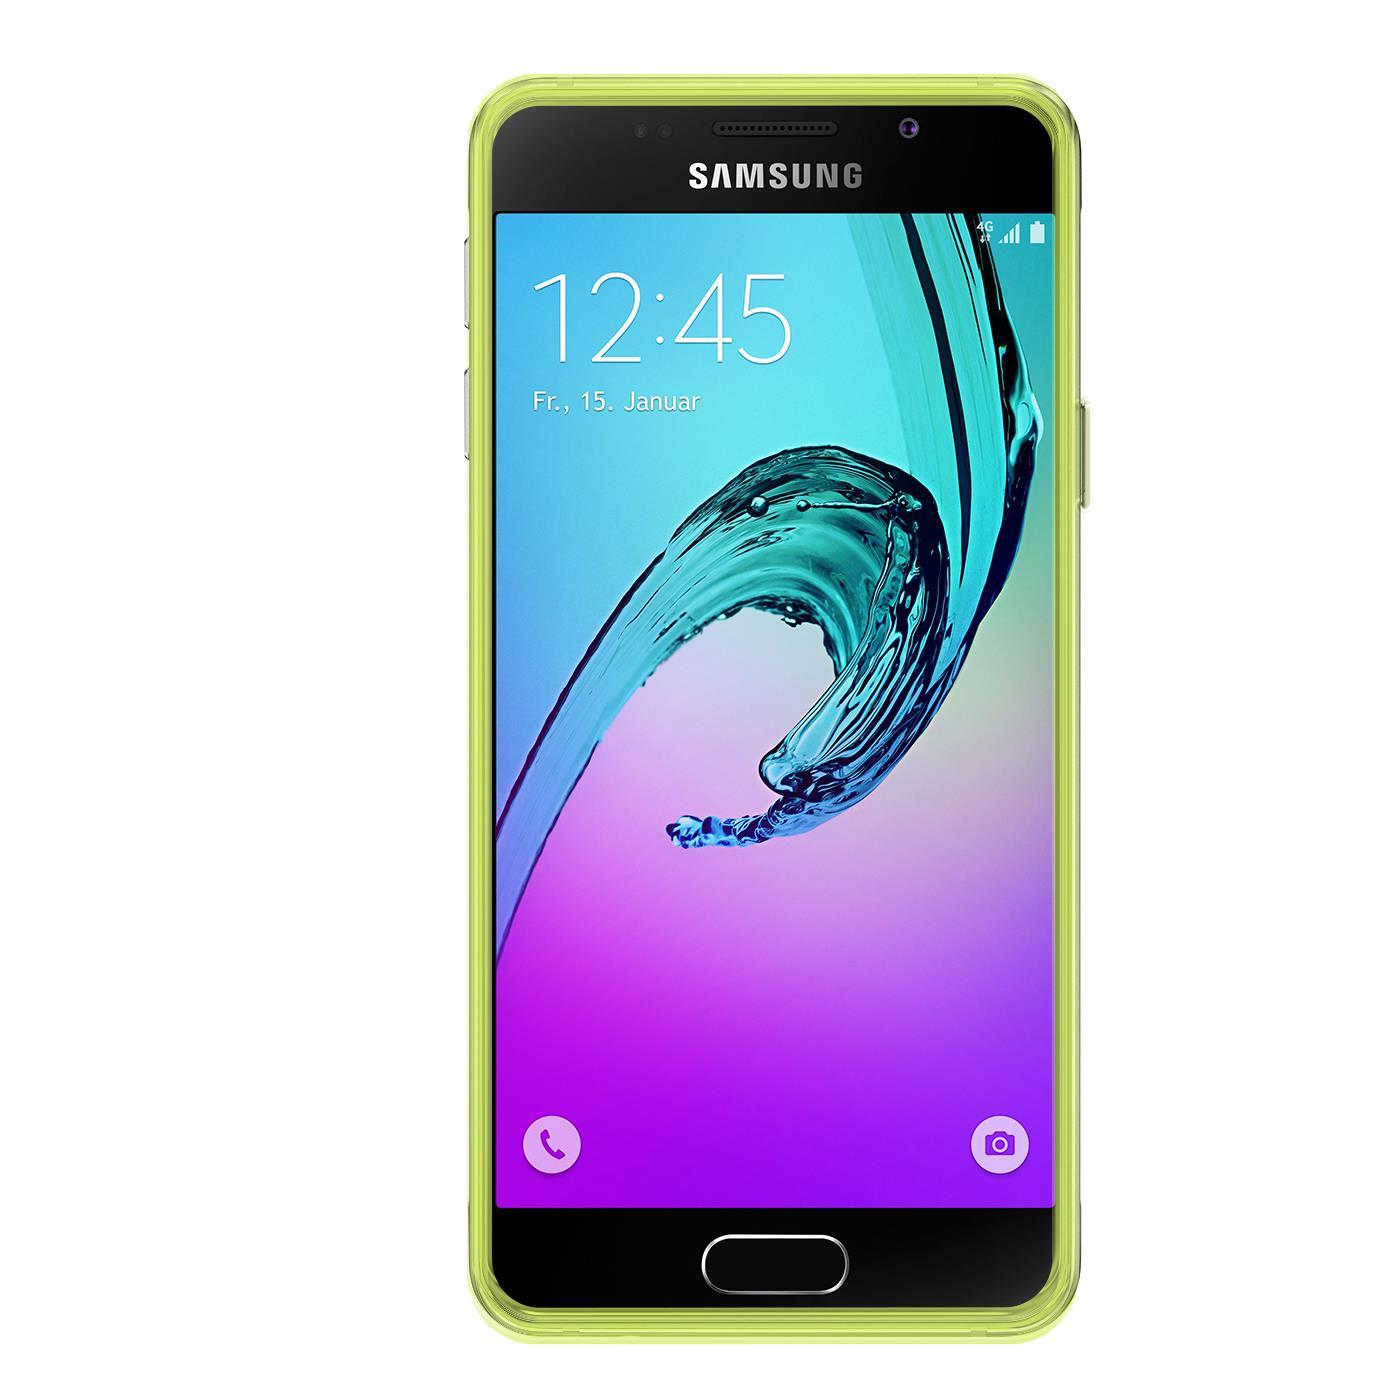 Samsung-Galaxy-a3-2016-Thin-Silikon-Klar-Case-Cover-Ultra-Slim-Stossfeste-Gel Indexbild 13